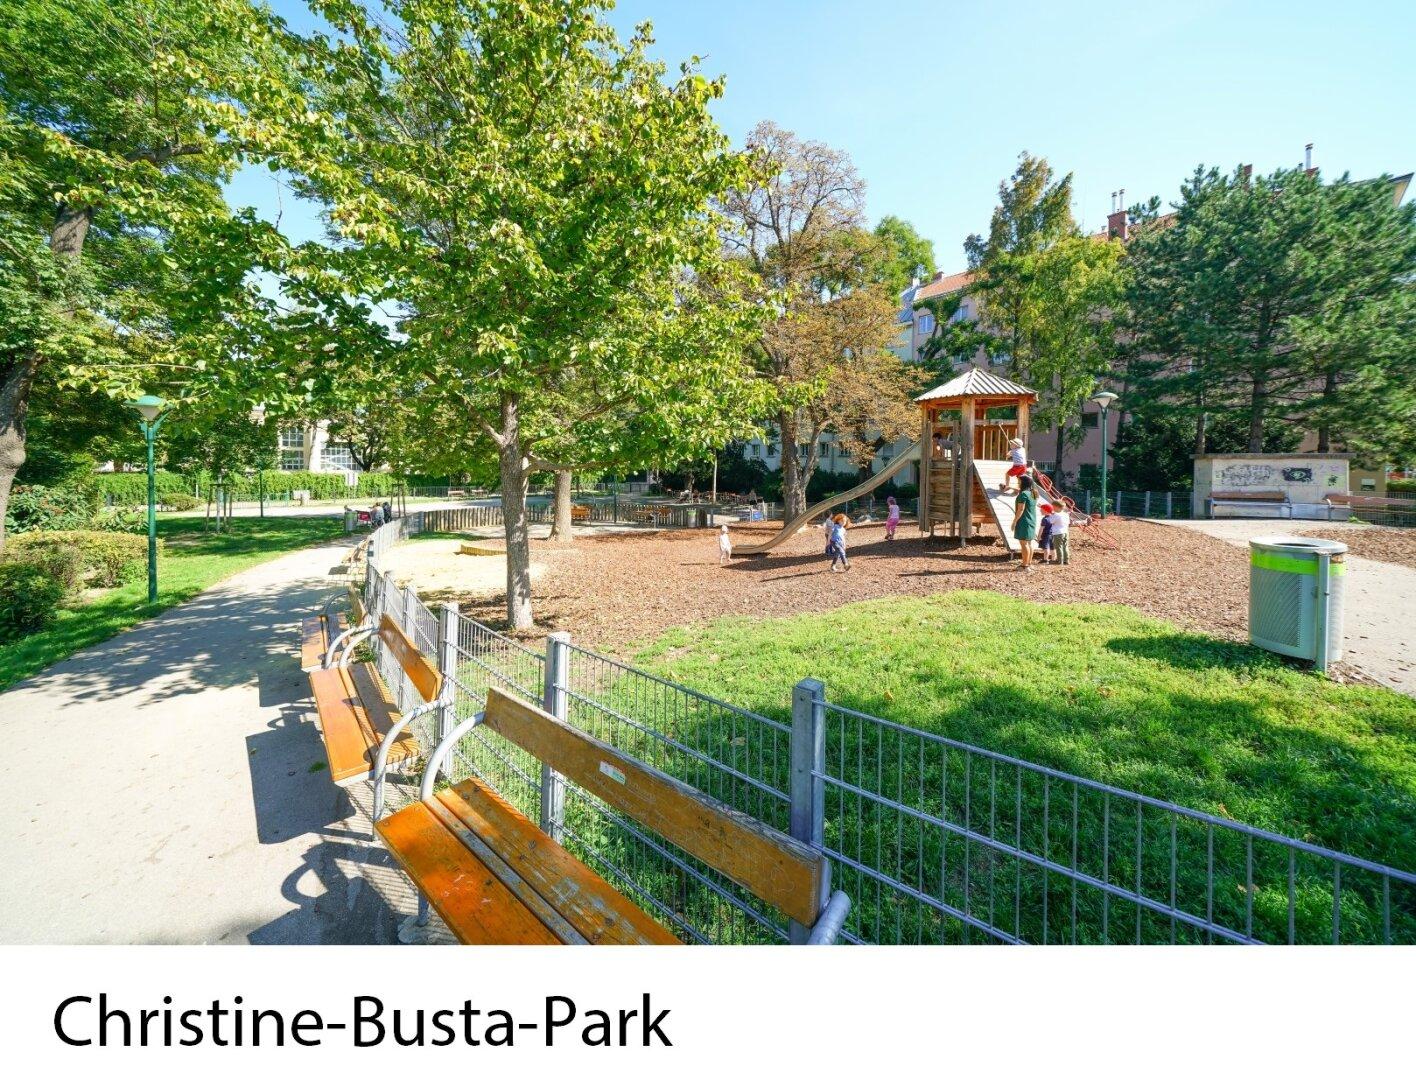 Christine Busta Park